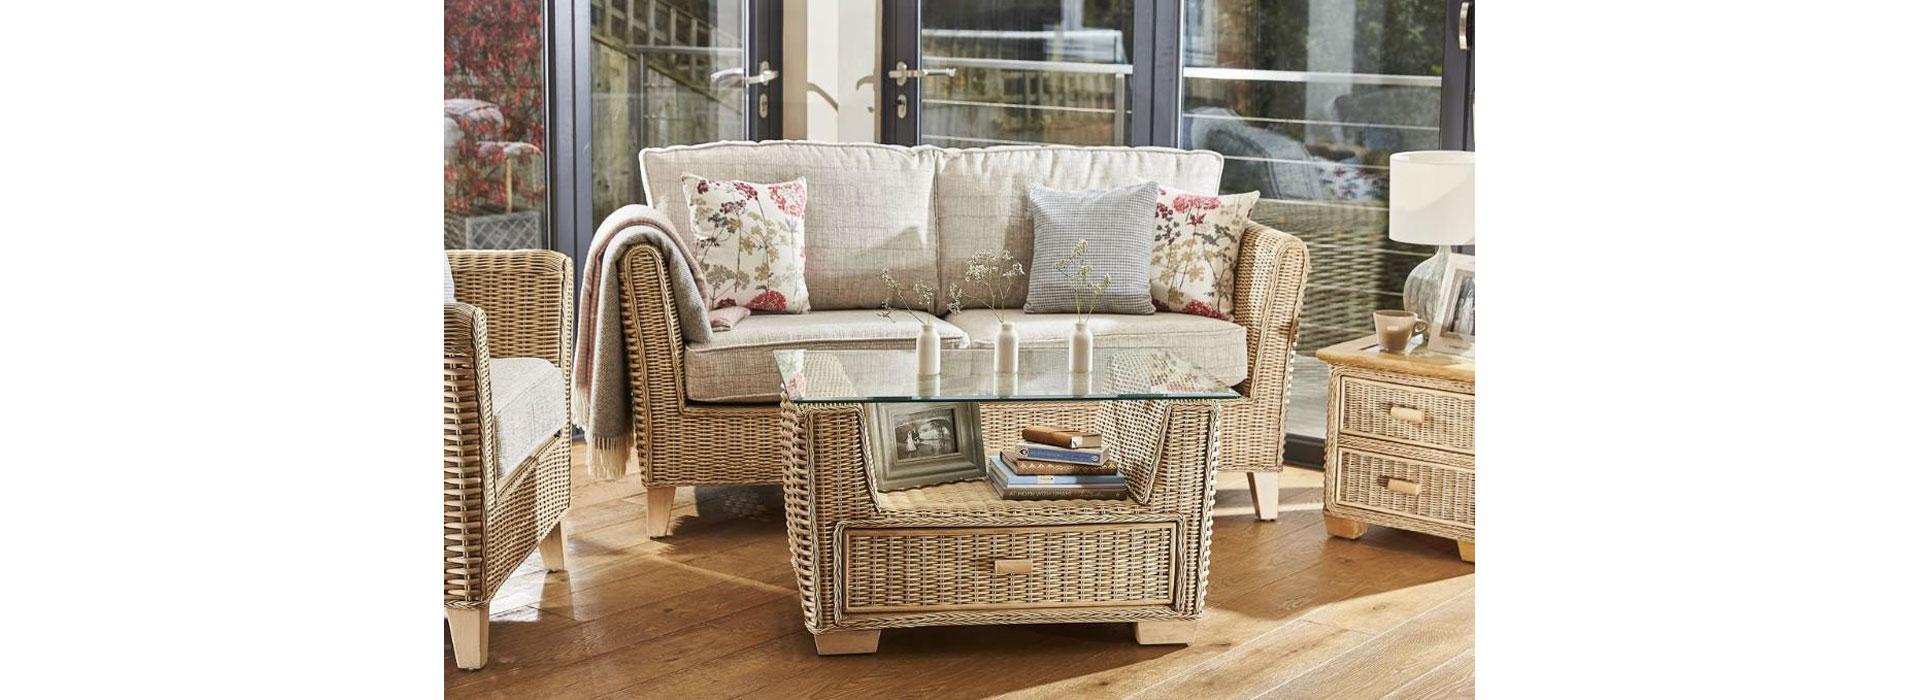 Daro Milford Rattan Range Harpers Furniture Ipswich